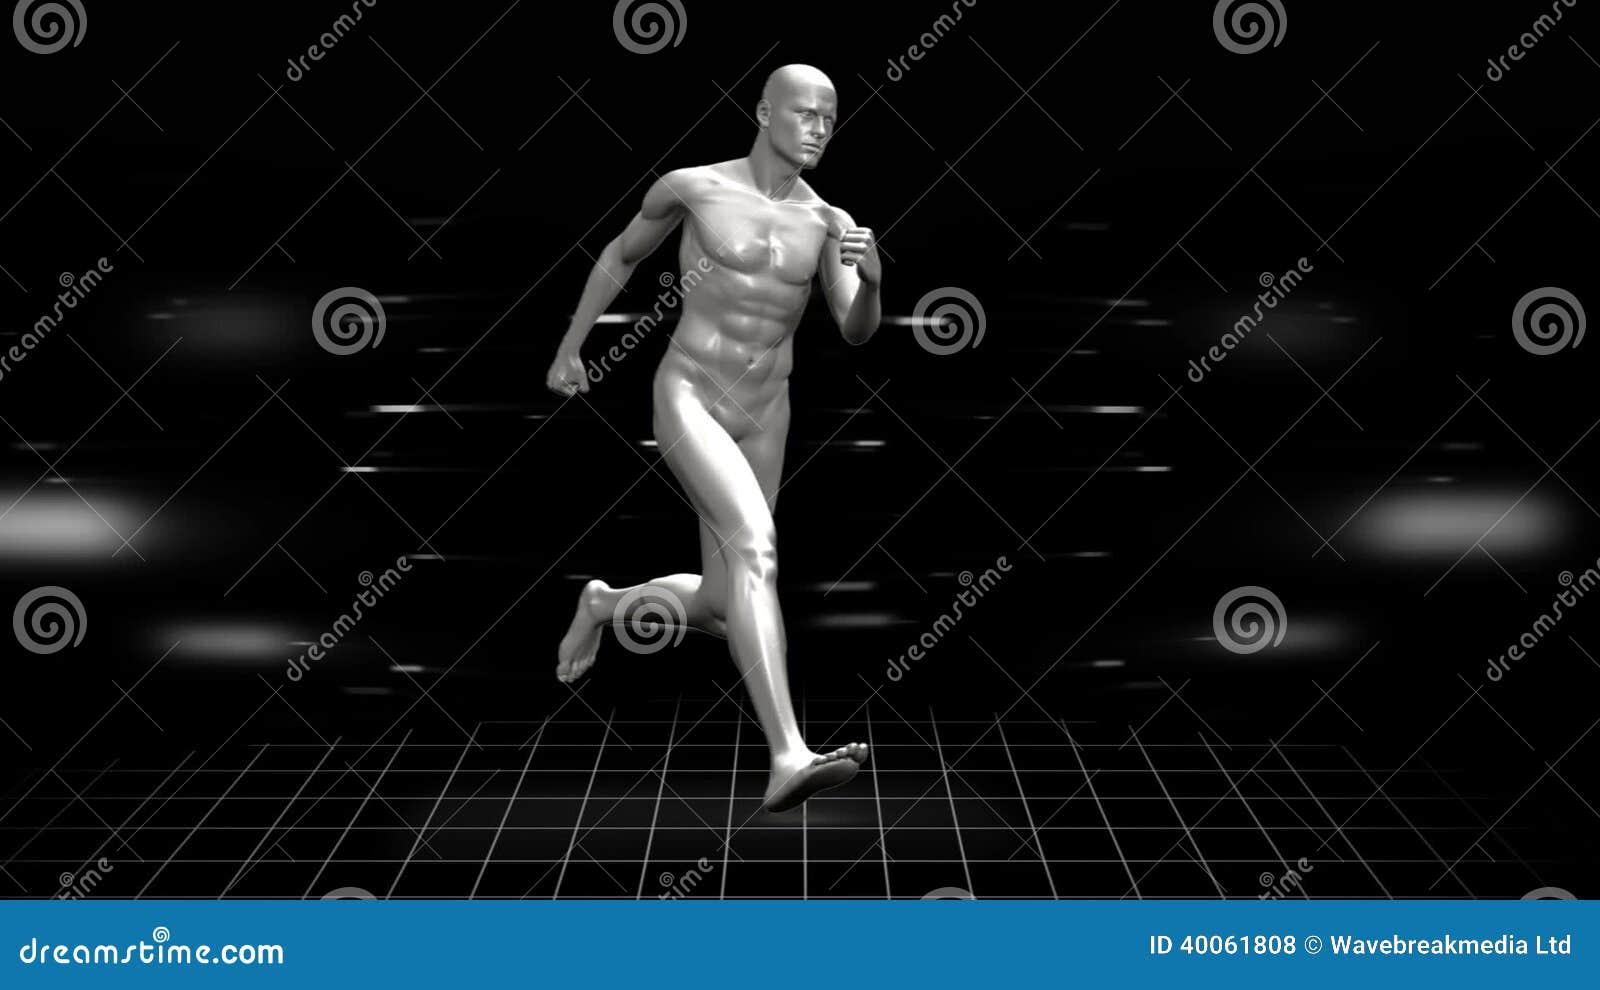 Full body scan thumbs